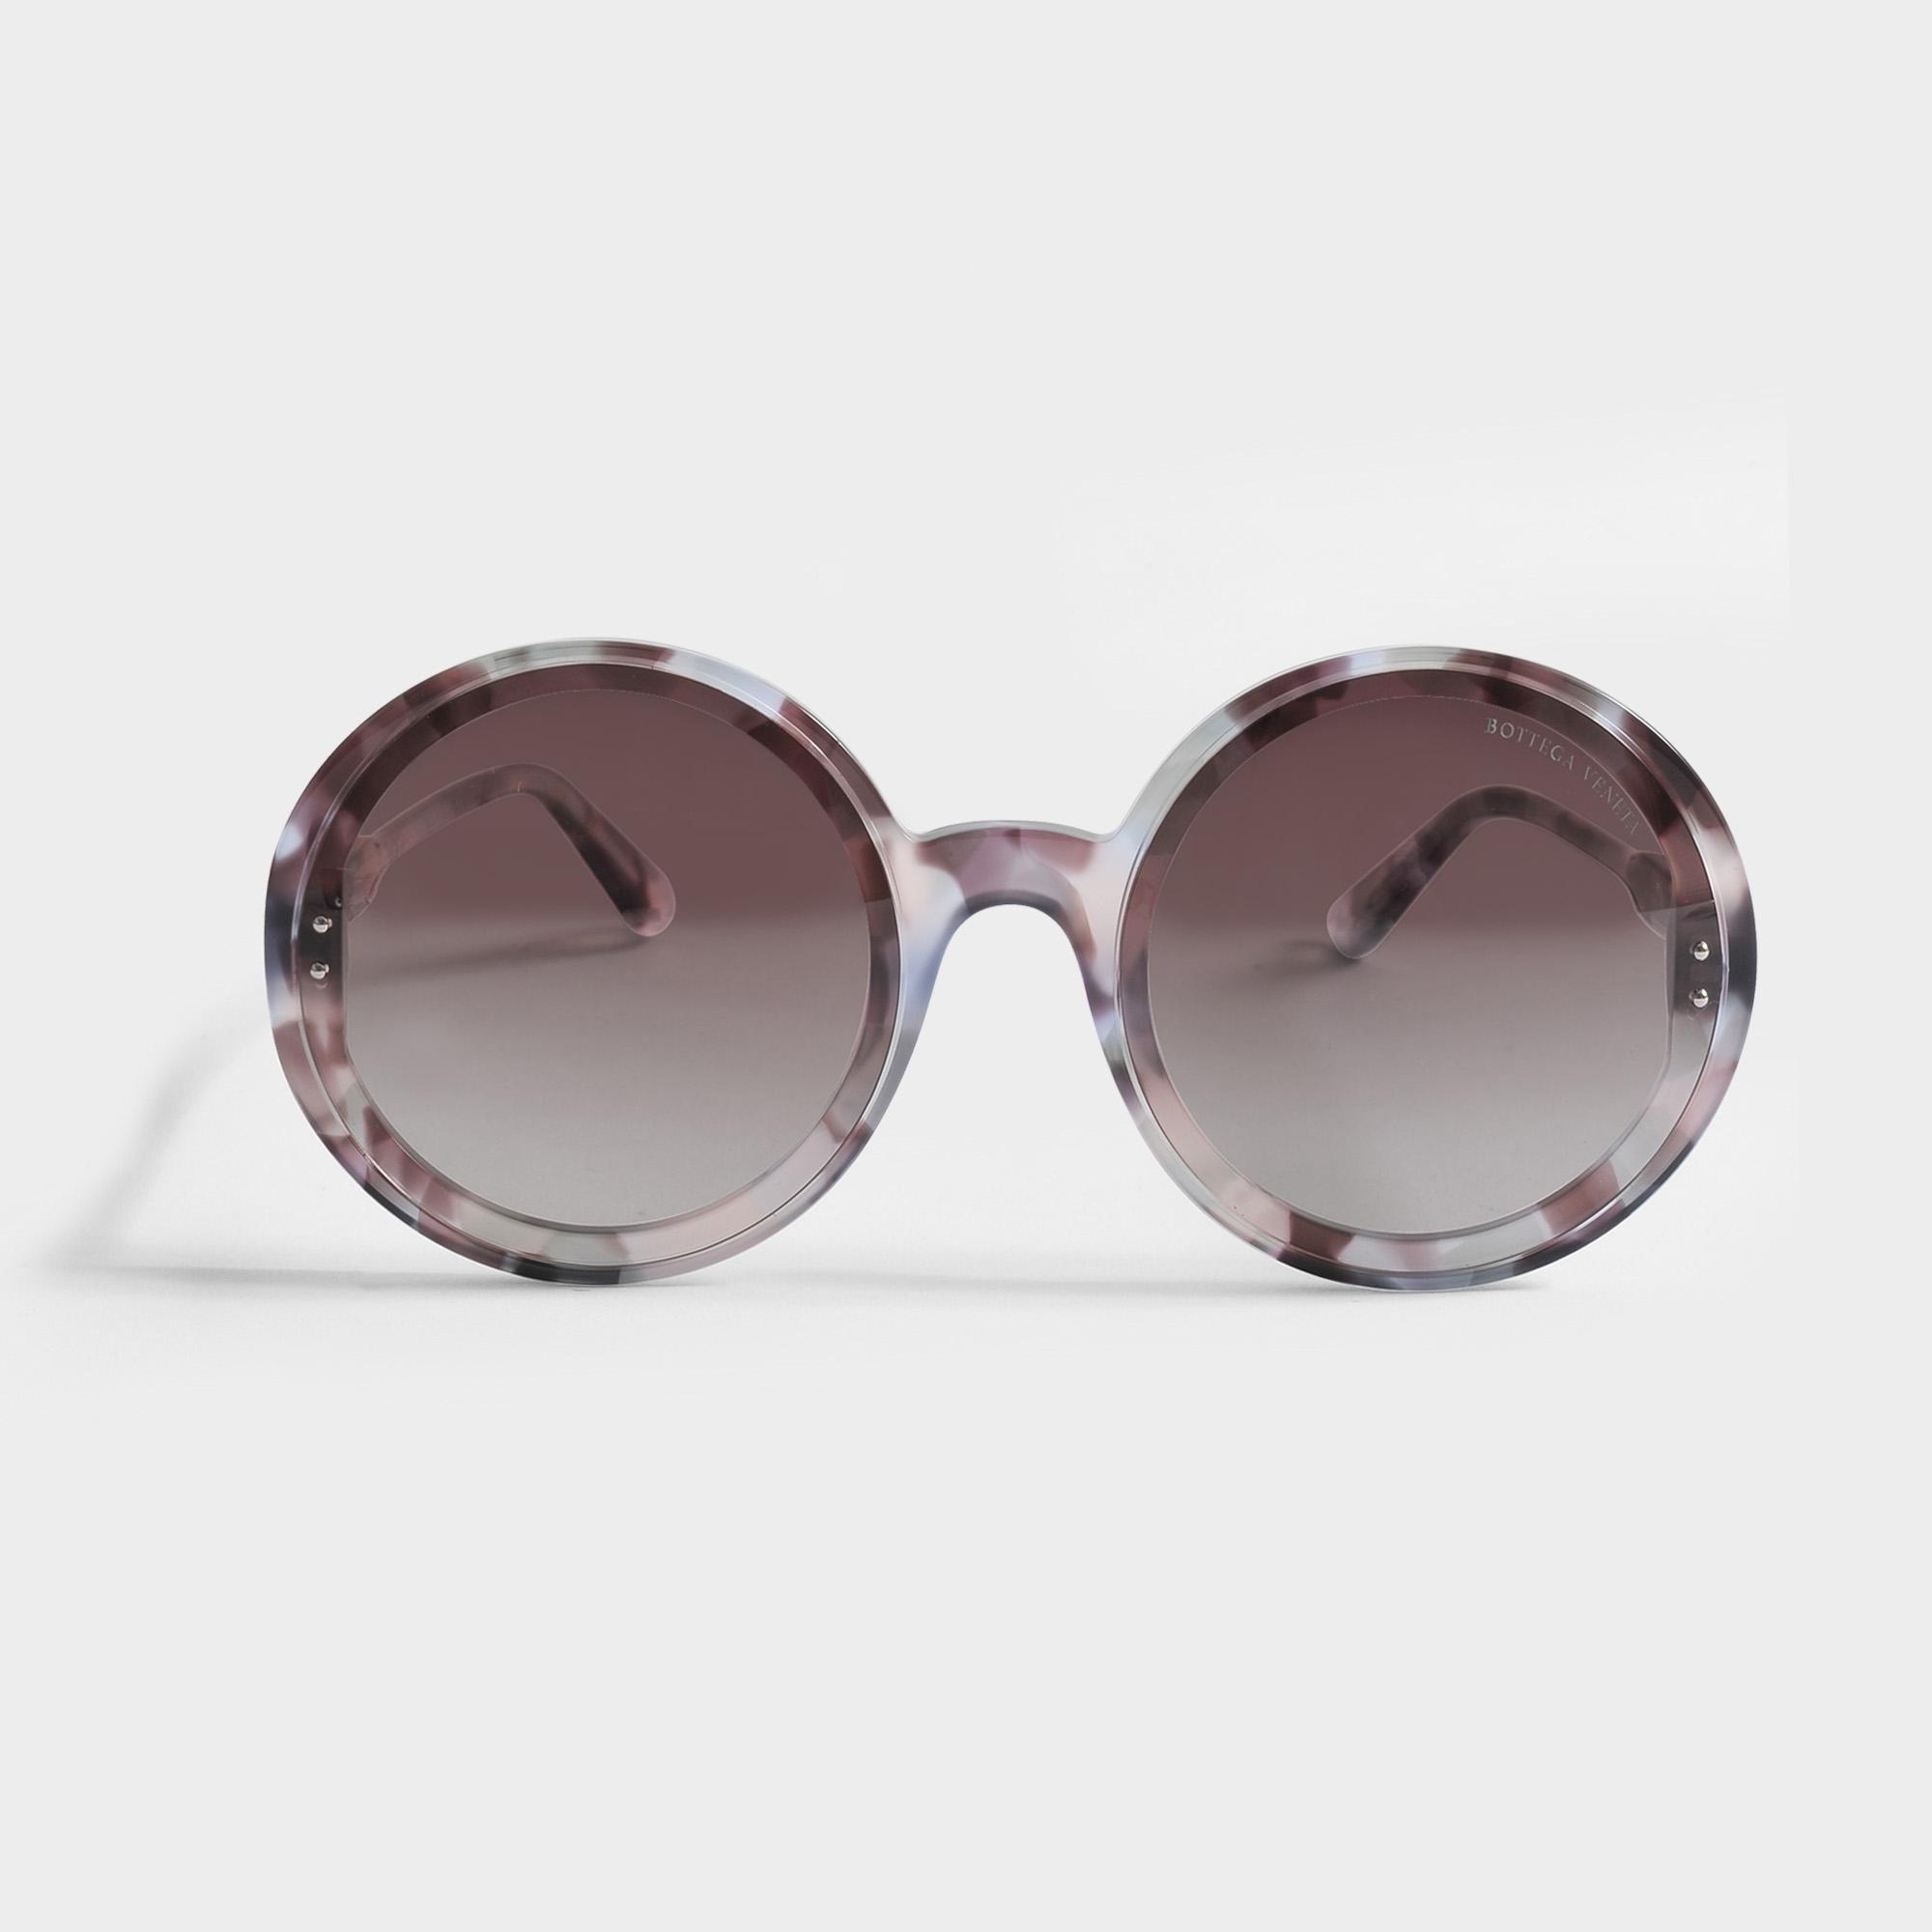 Bottega Veneta Multi Treatment Sonnenbrille aus Havana Acetat l3vp6xz